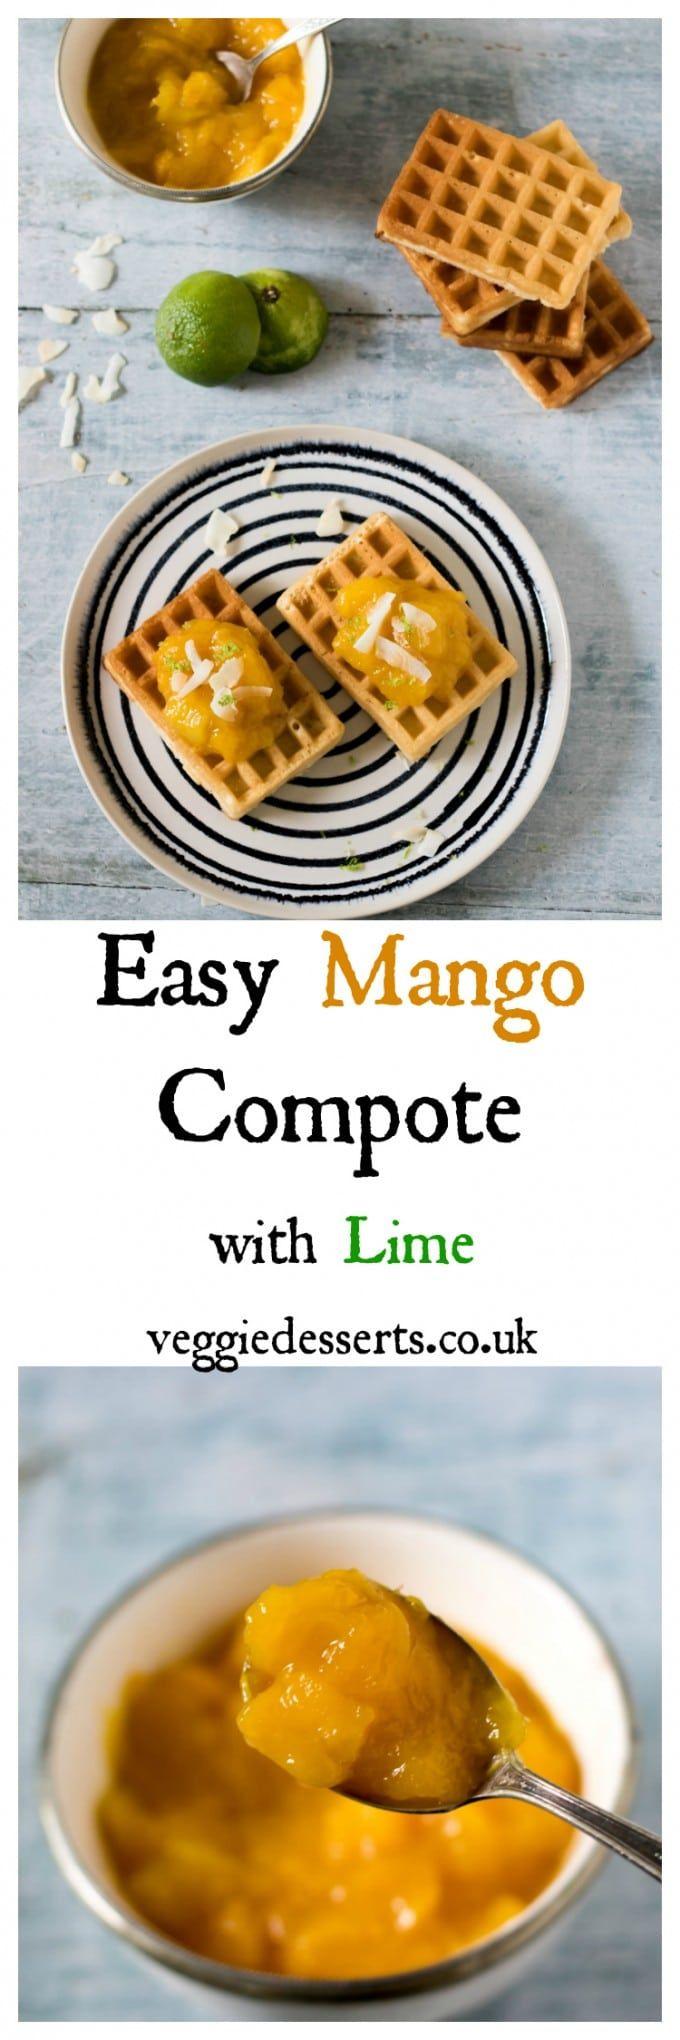 Mejores 5206 imgenes de top uk food blog recipes en pinterest easy mango compote recipe veggie desserts blog forumfinder Image collections